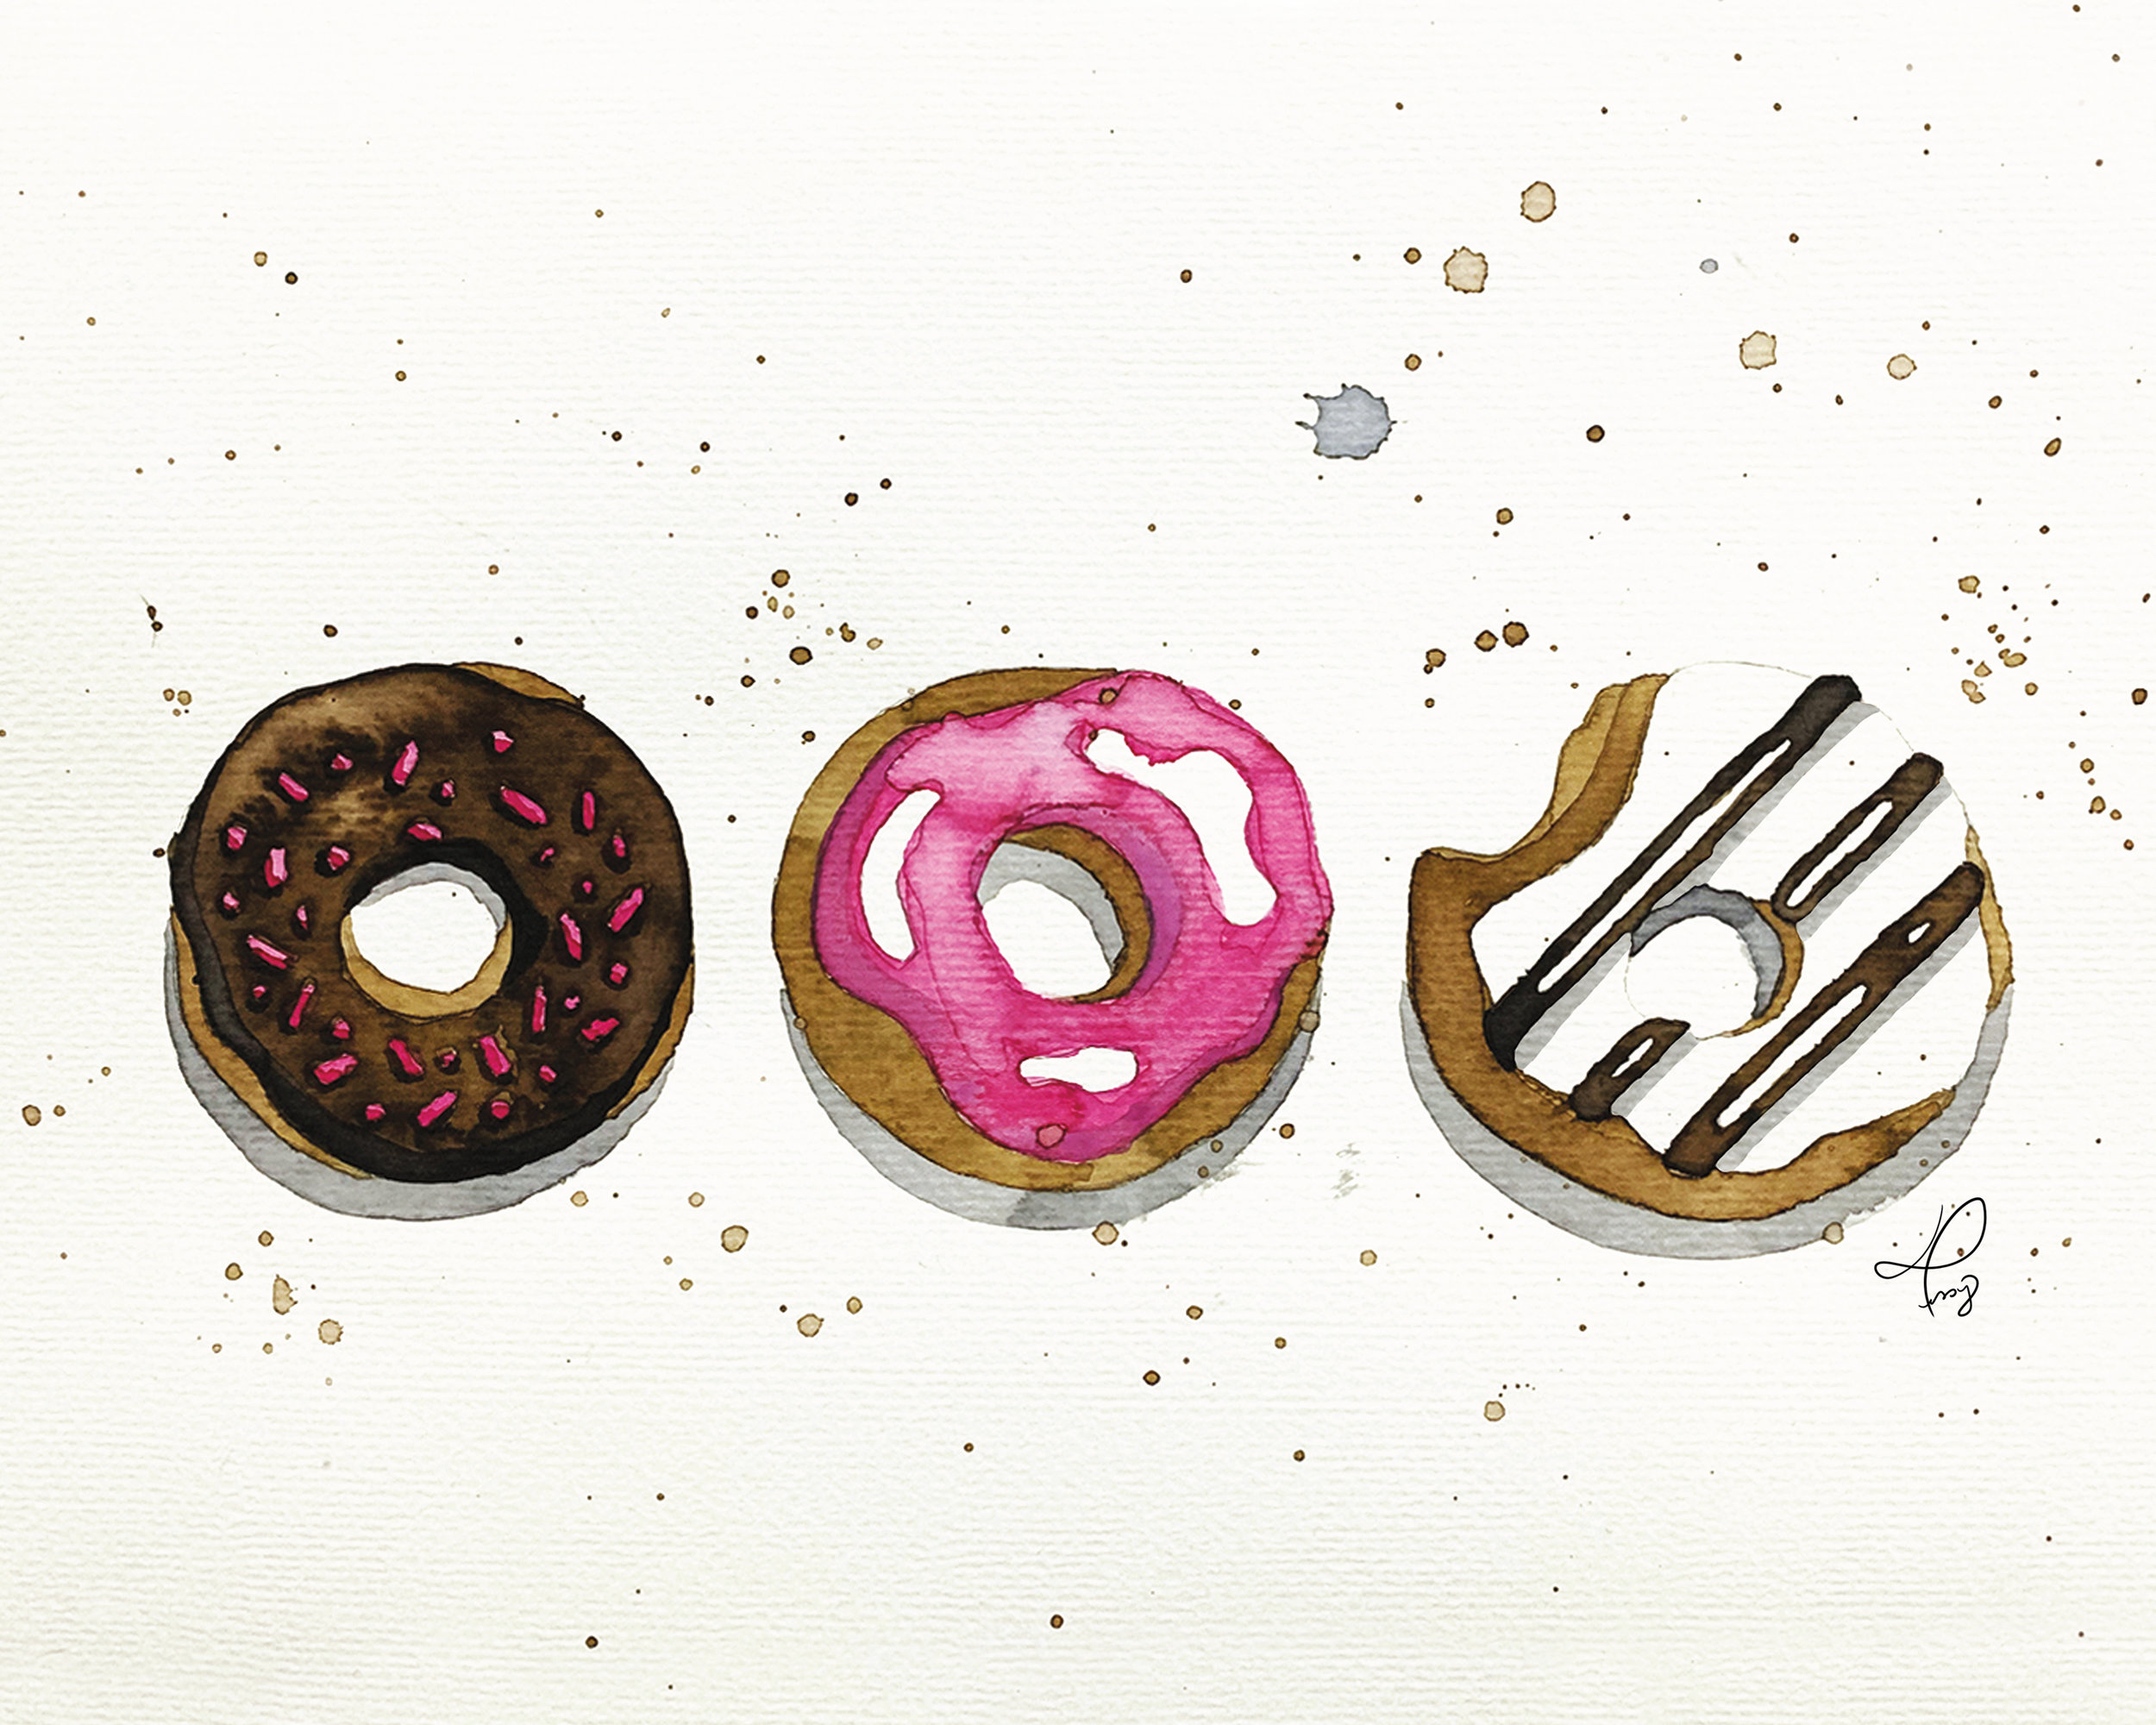 Donut 10x8.jpg